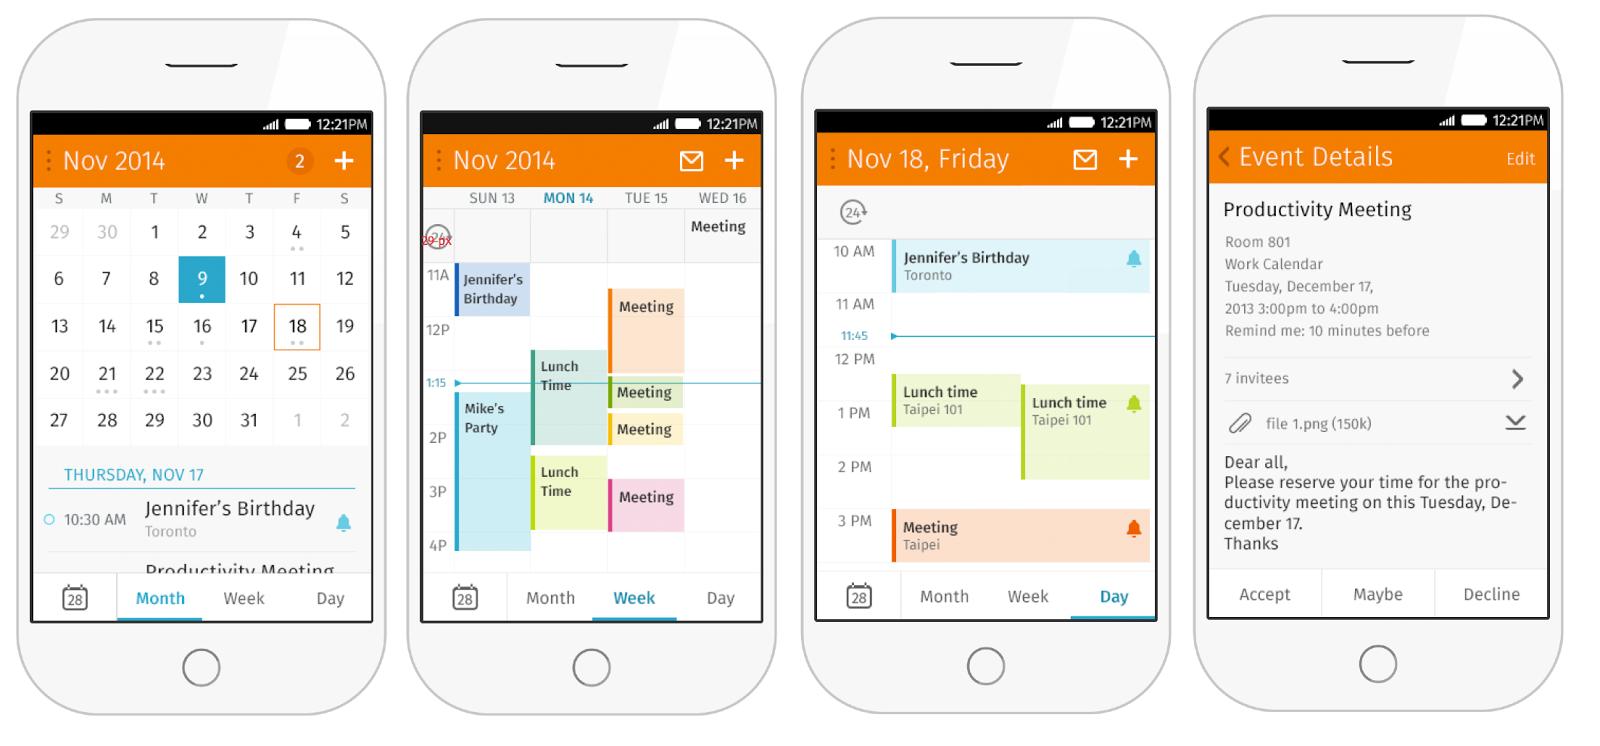 firefoxos - E-mail client, and Calendar